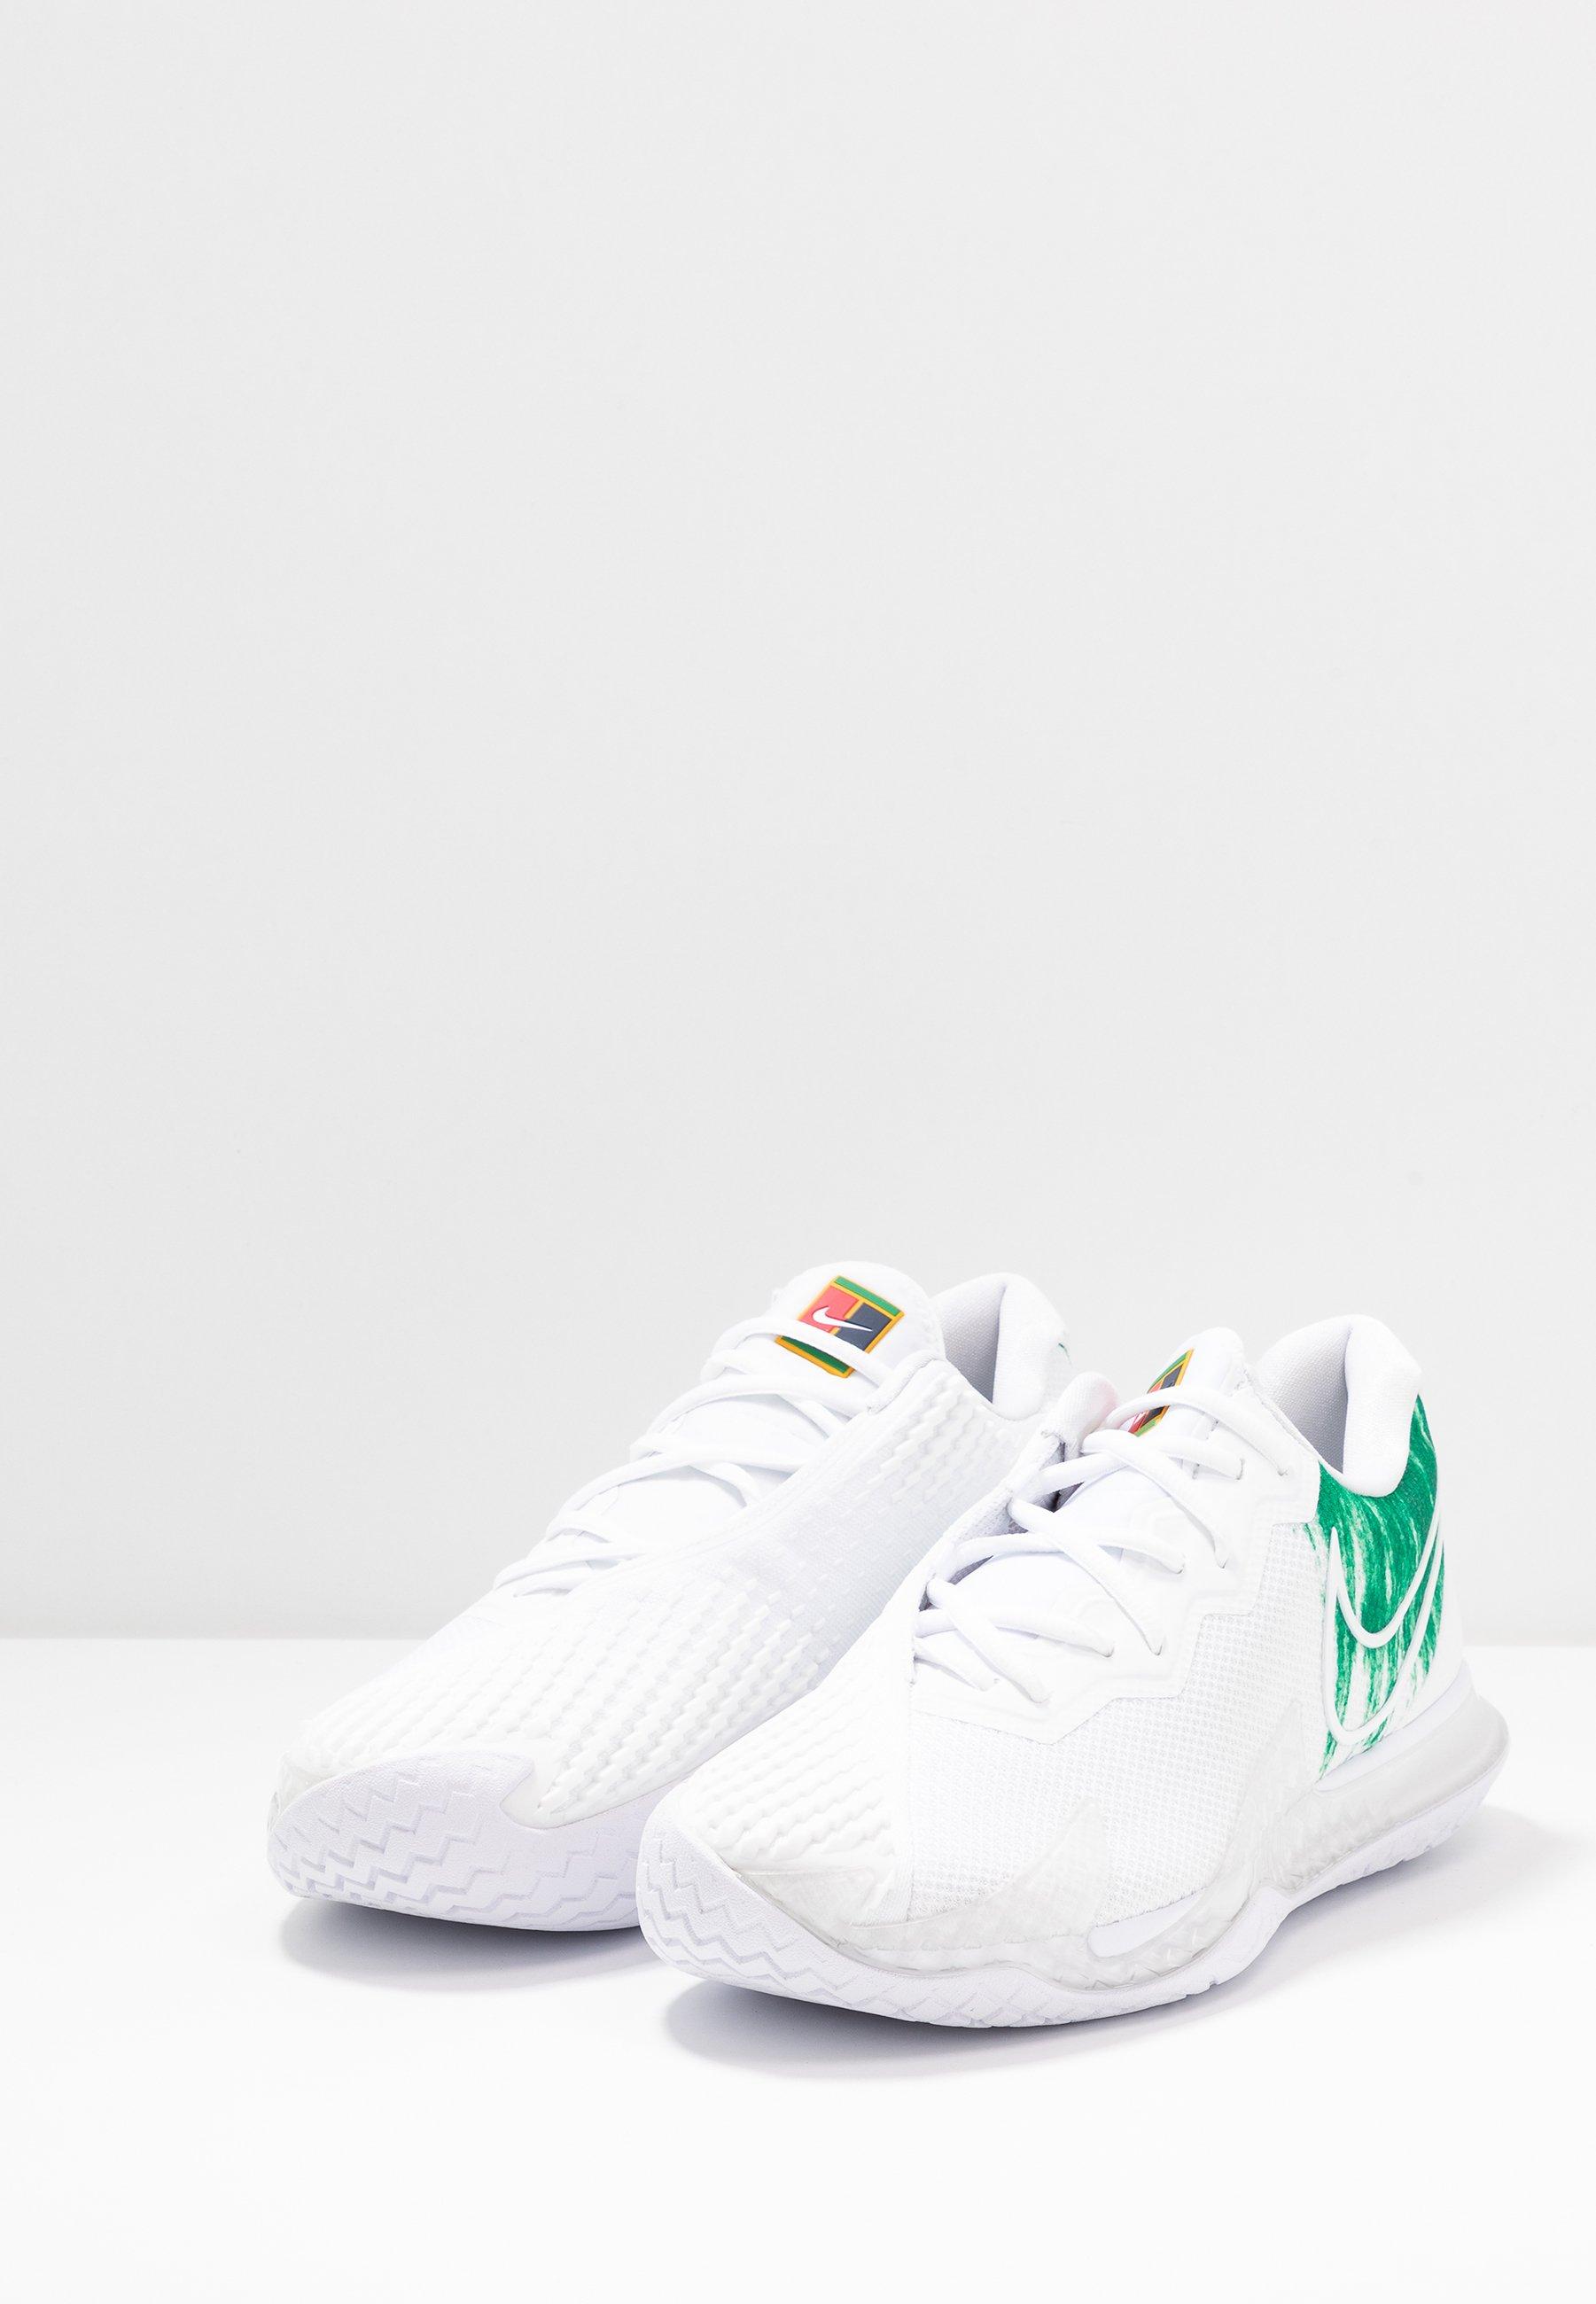 Nike Performance AIR ZOOM VAPOR CAGE 4 - Multicourt Tennisschuh - white/clover/weiß - Herrenschuhe VcUCl